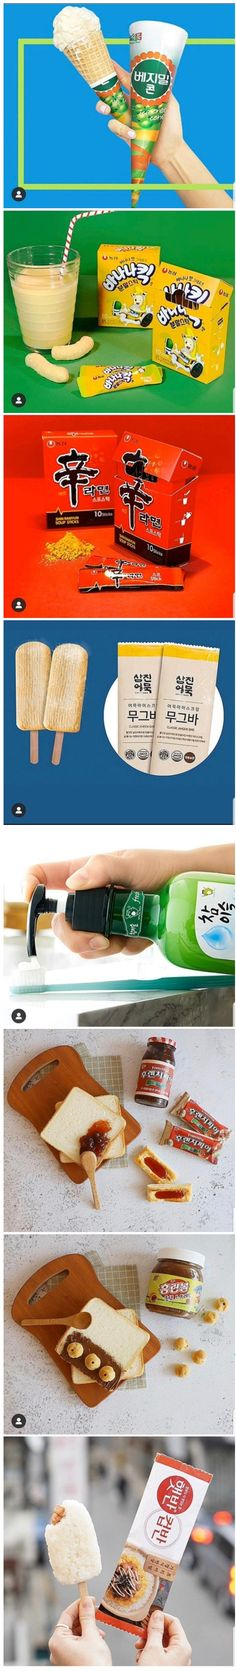 Punny Puns, Packaging Design, Geek Stuff, Jokes, Humor, Cooking, Food, Geek Things, Kitchen